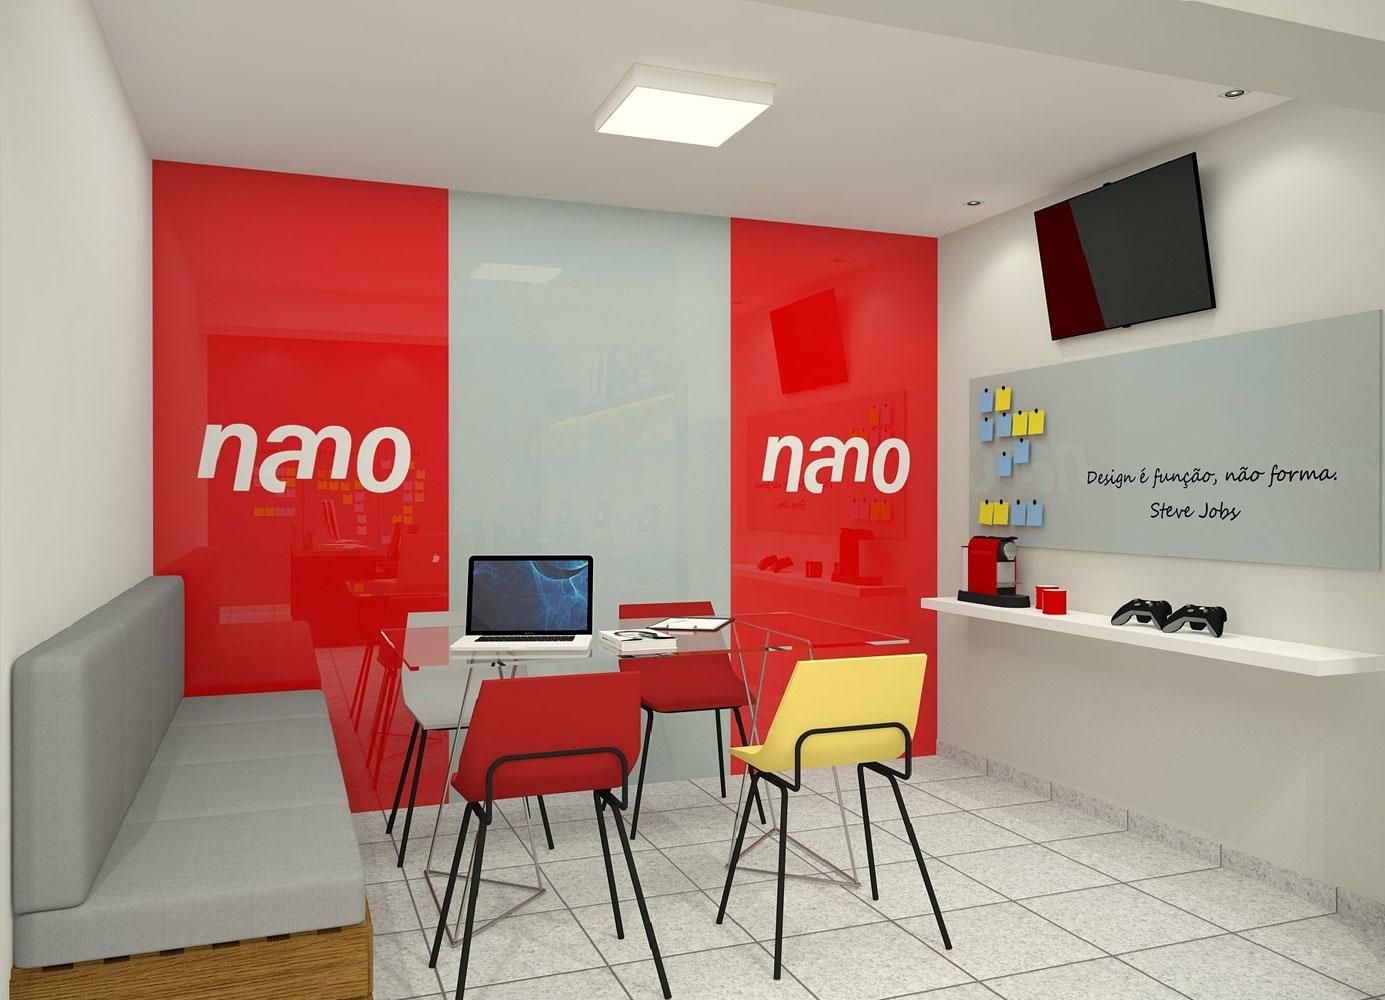 Imagem - Nano Incub